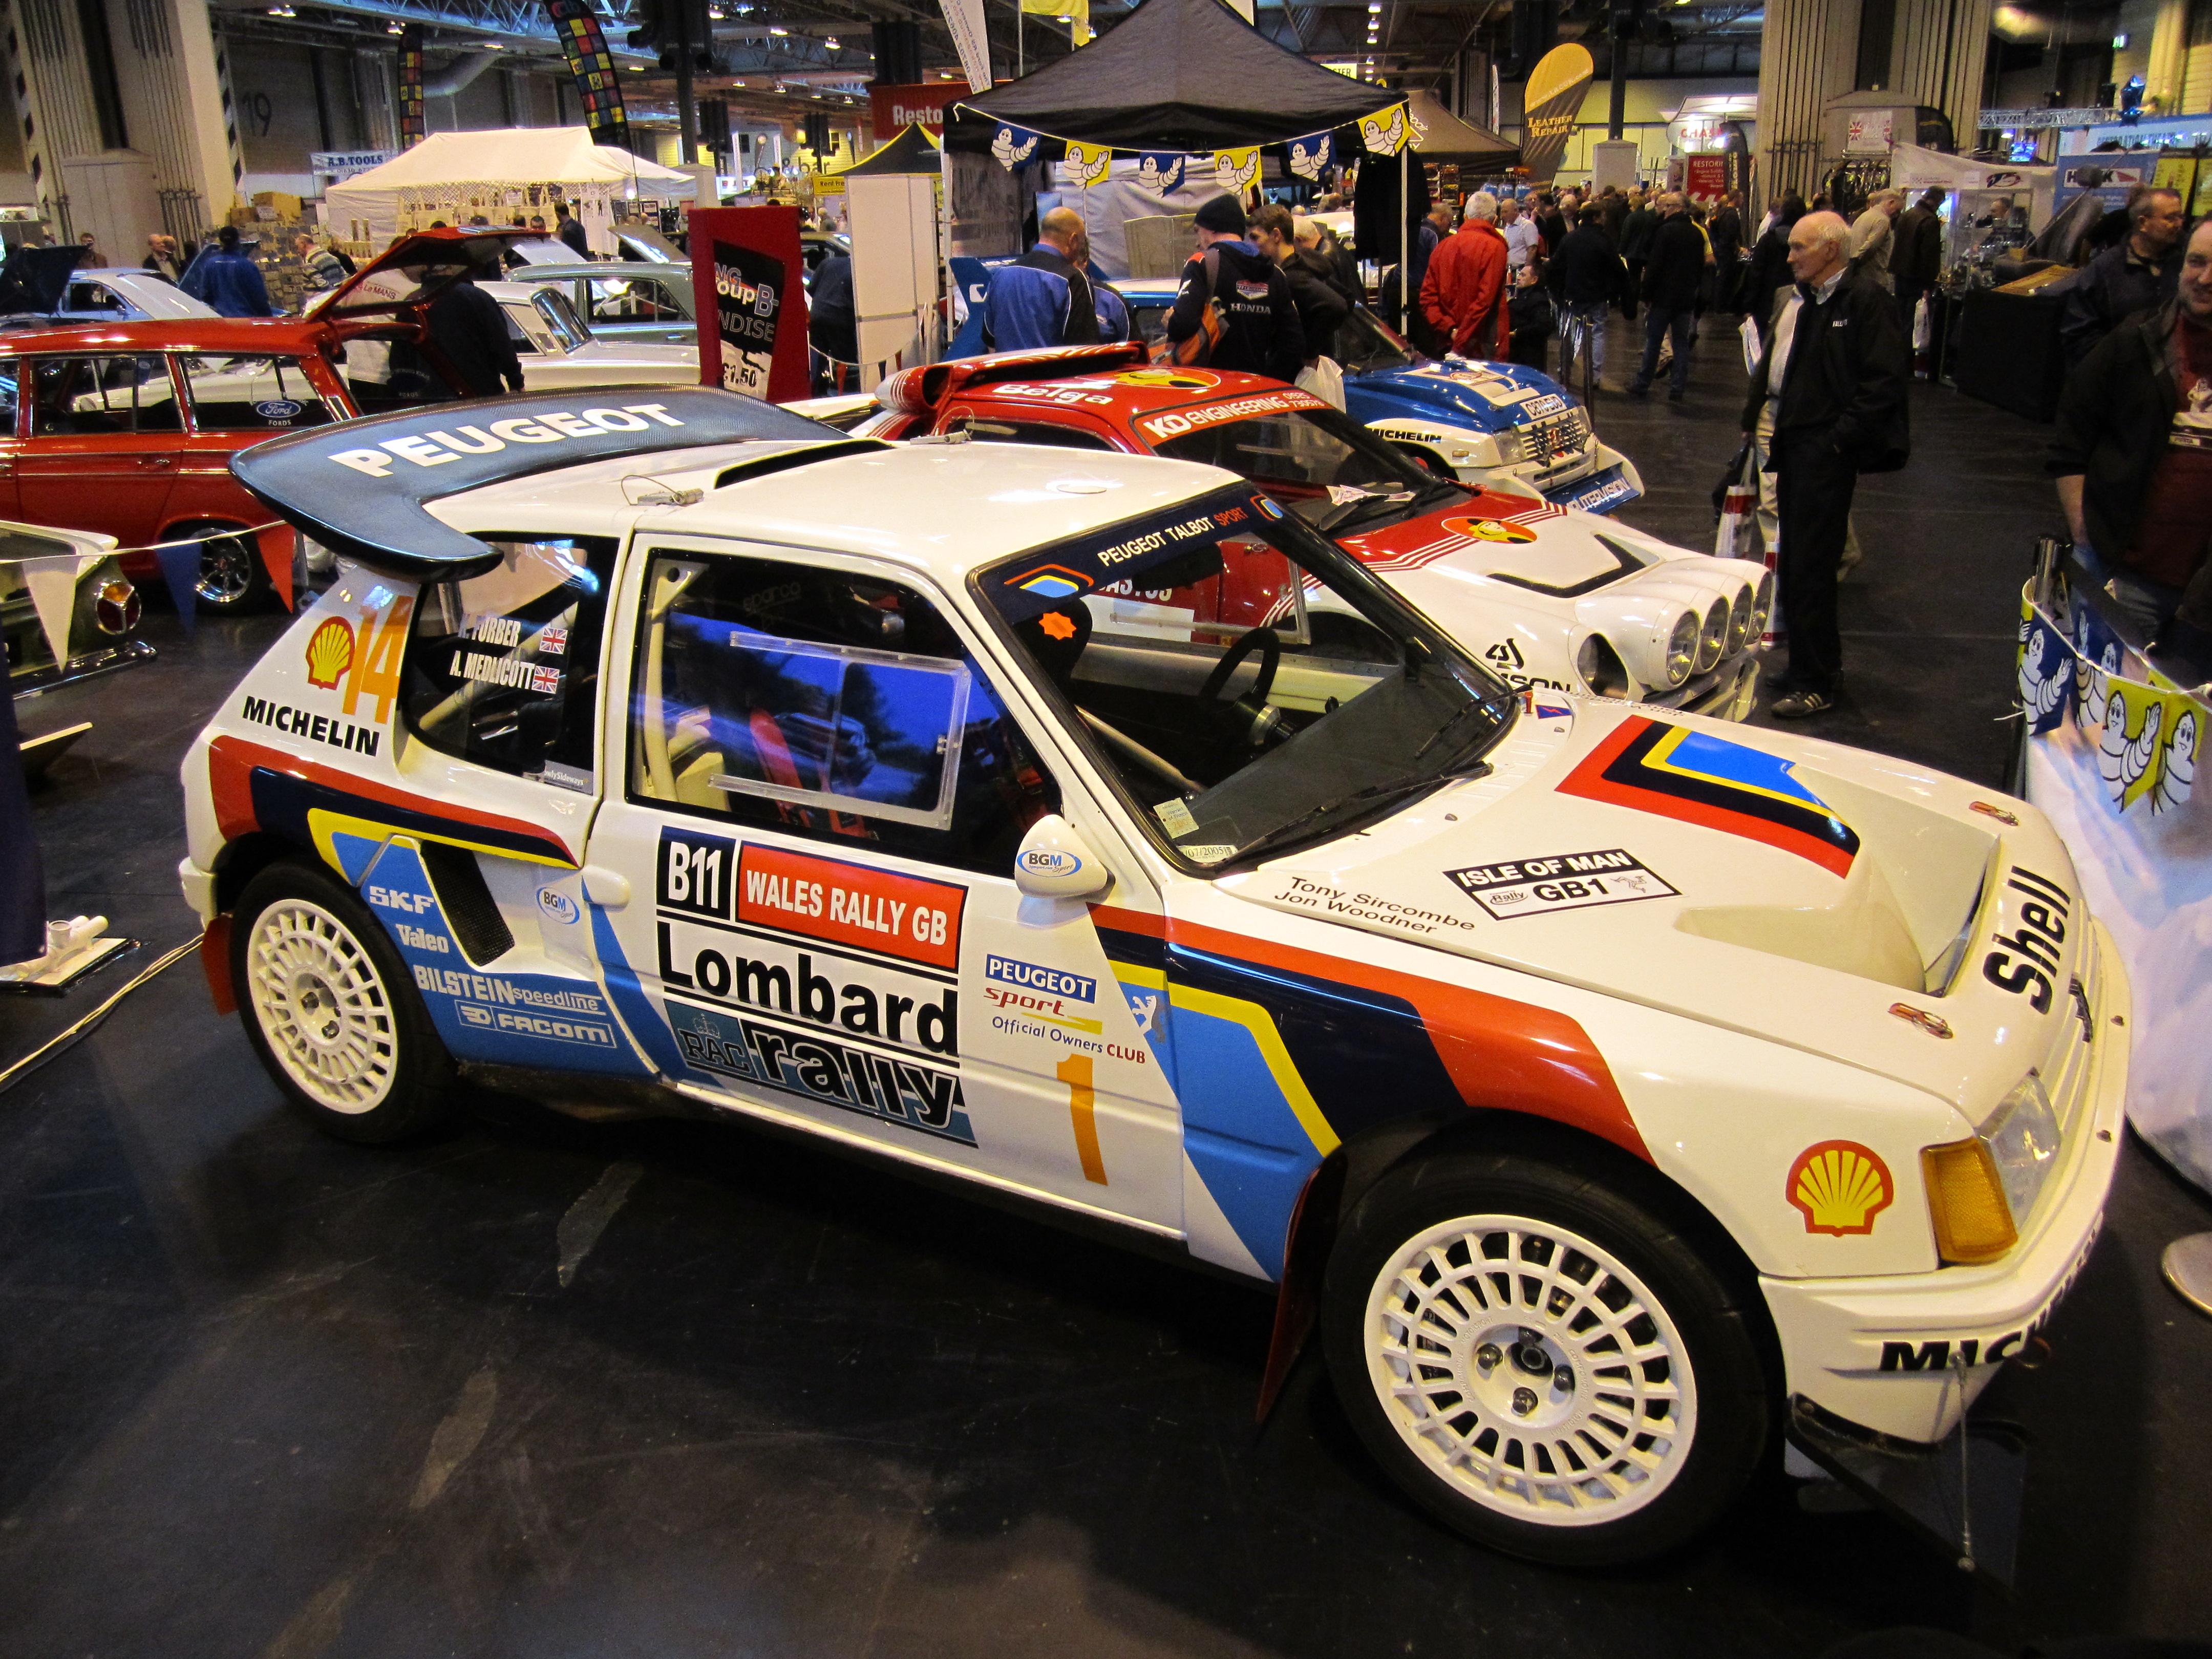 205 Group B Rally Car